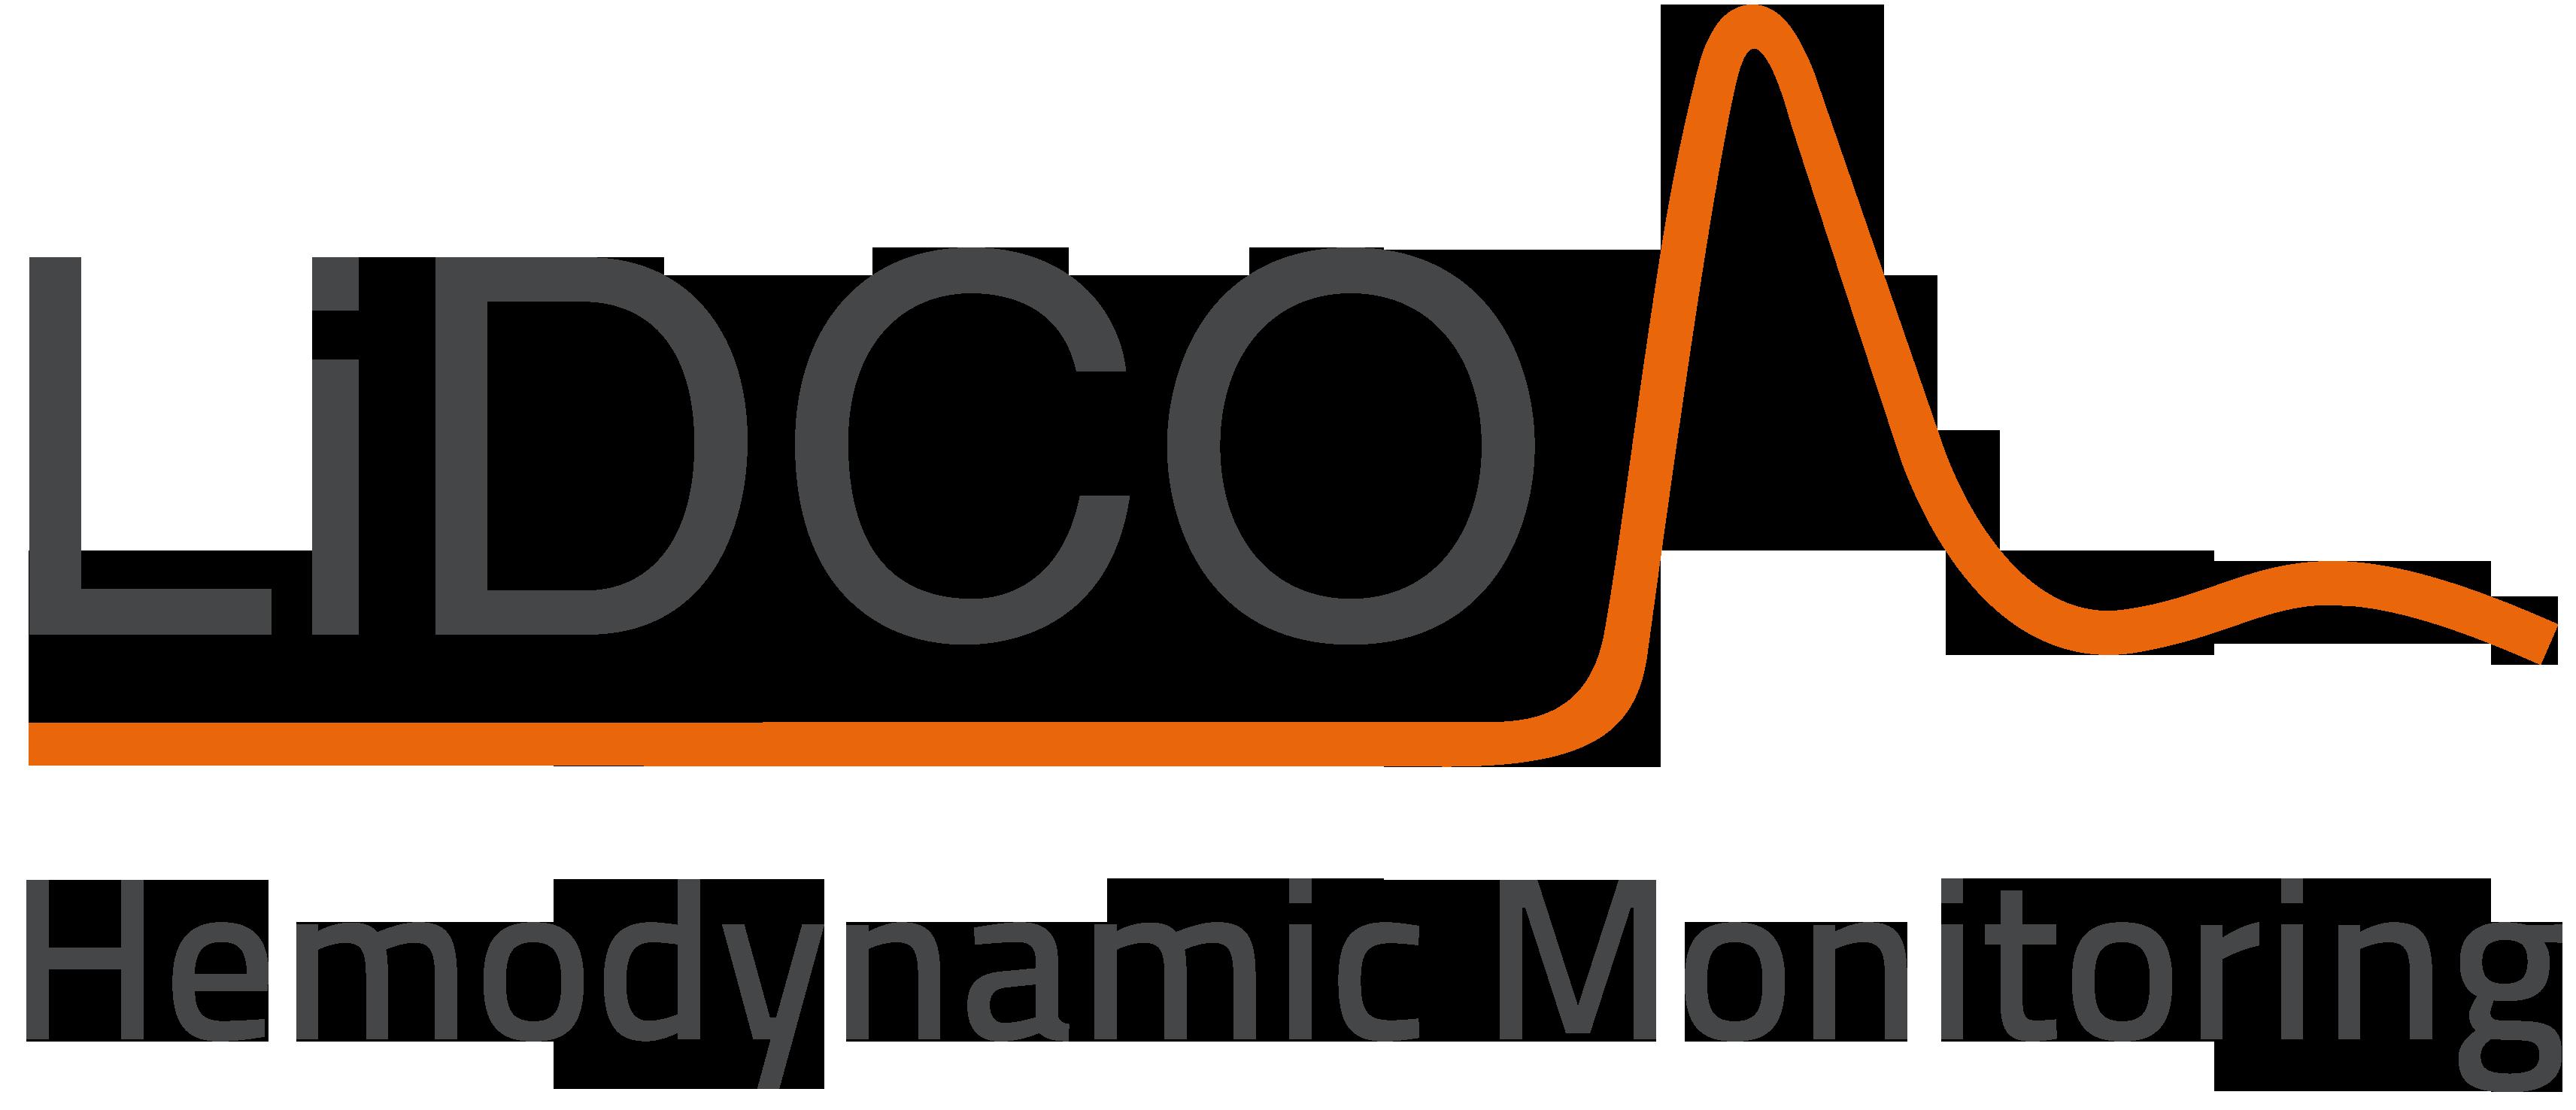 LiDCO Group plc logo